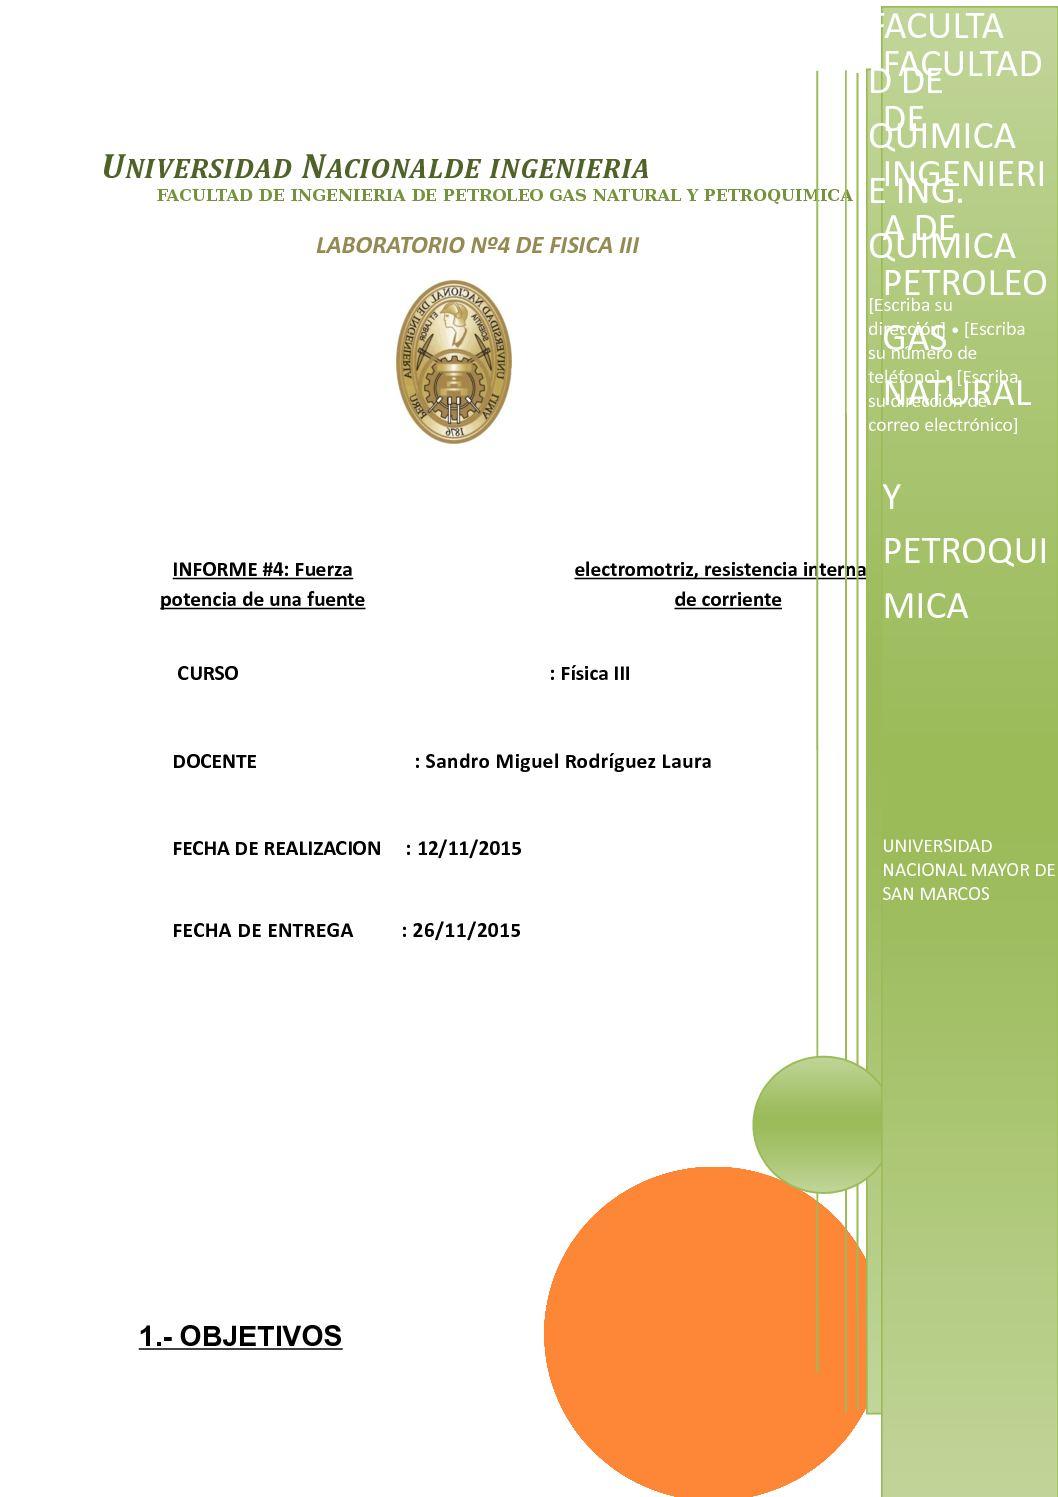 Informe N° 4 Fuerza Electromotriz